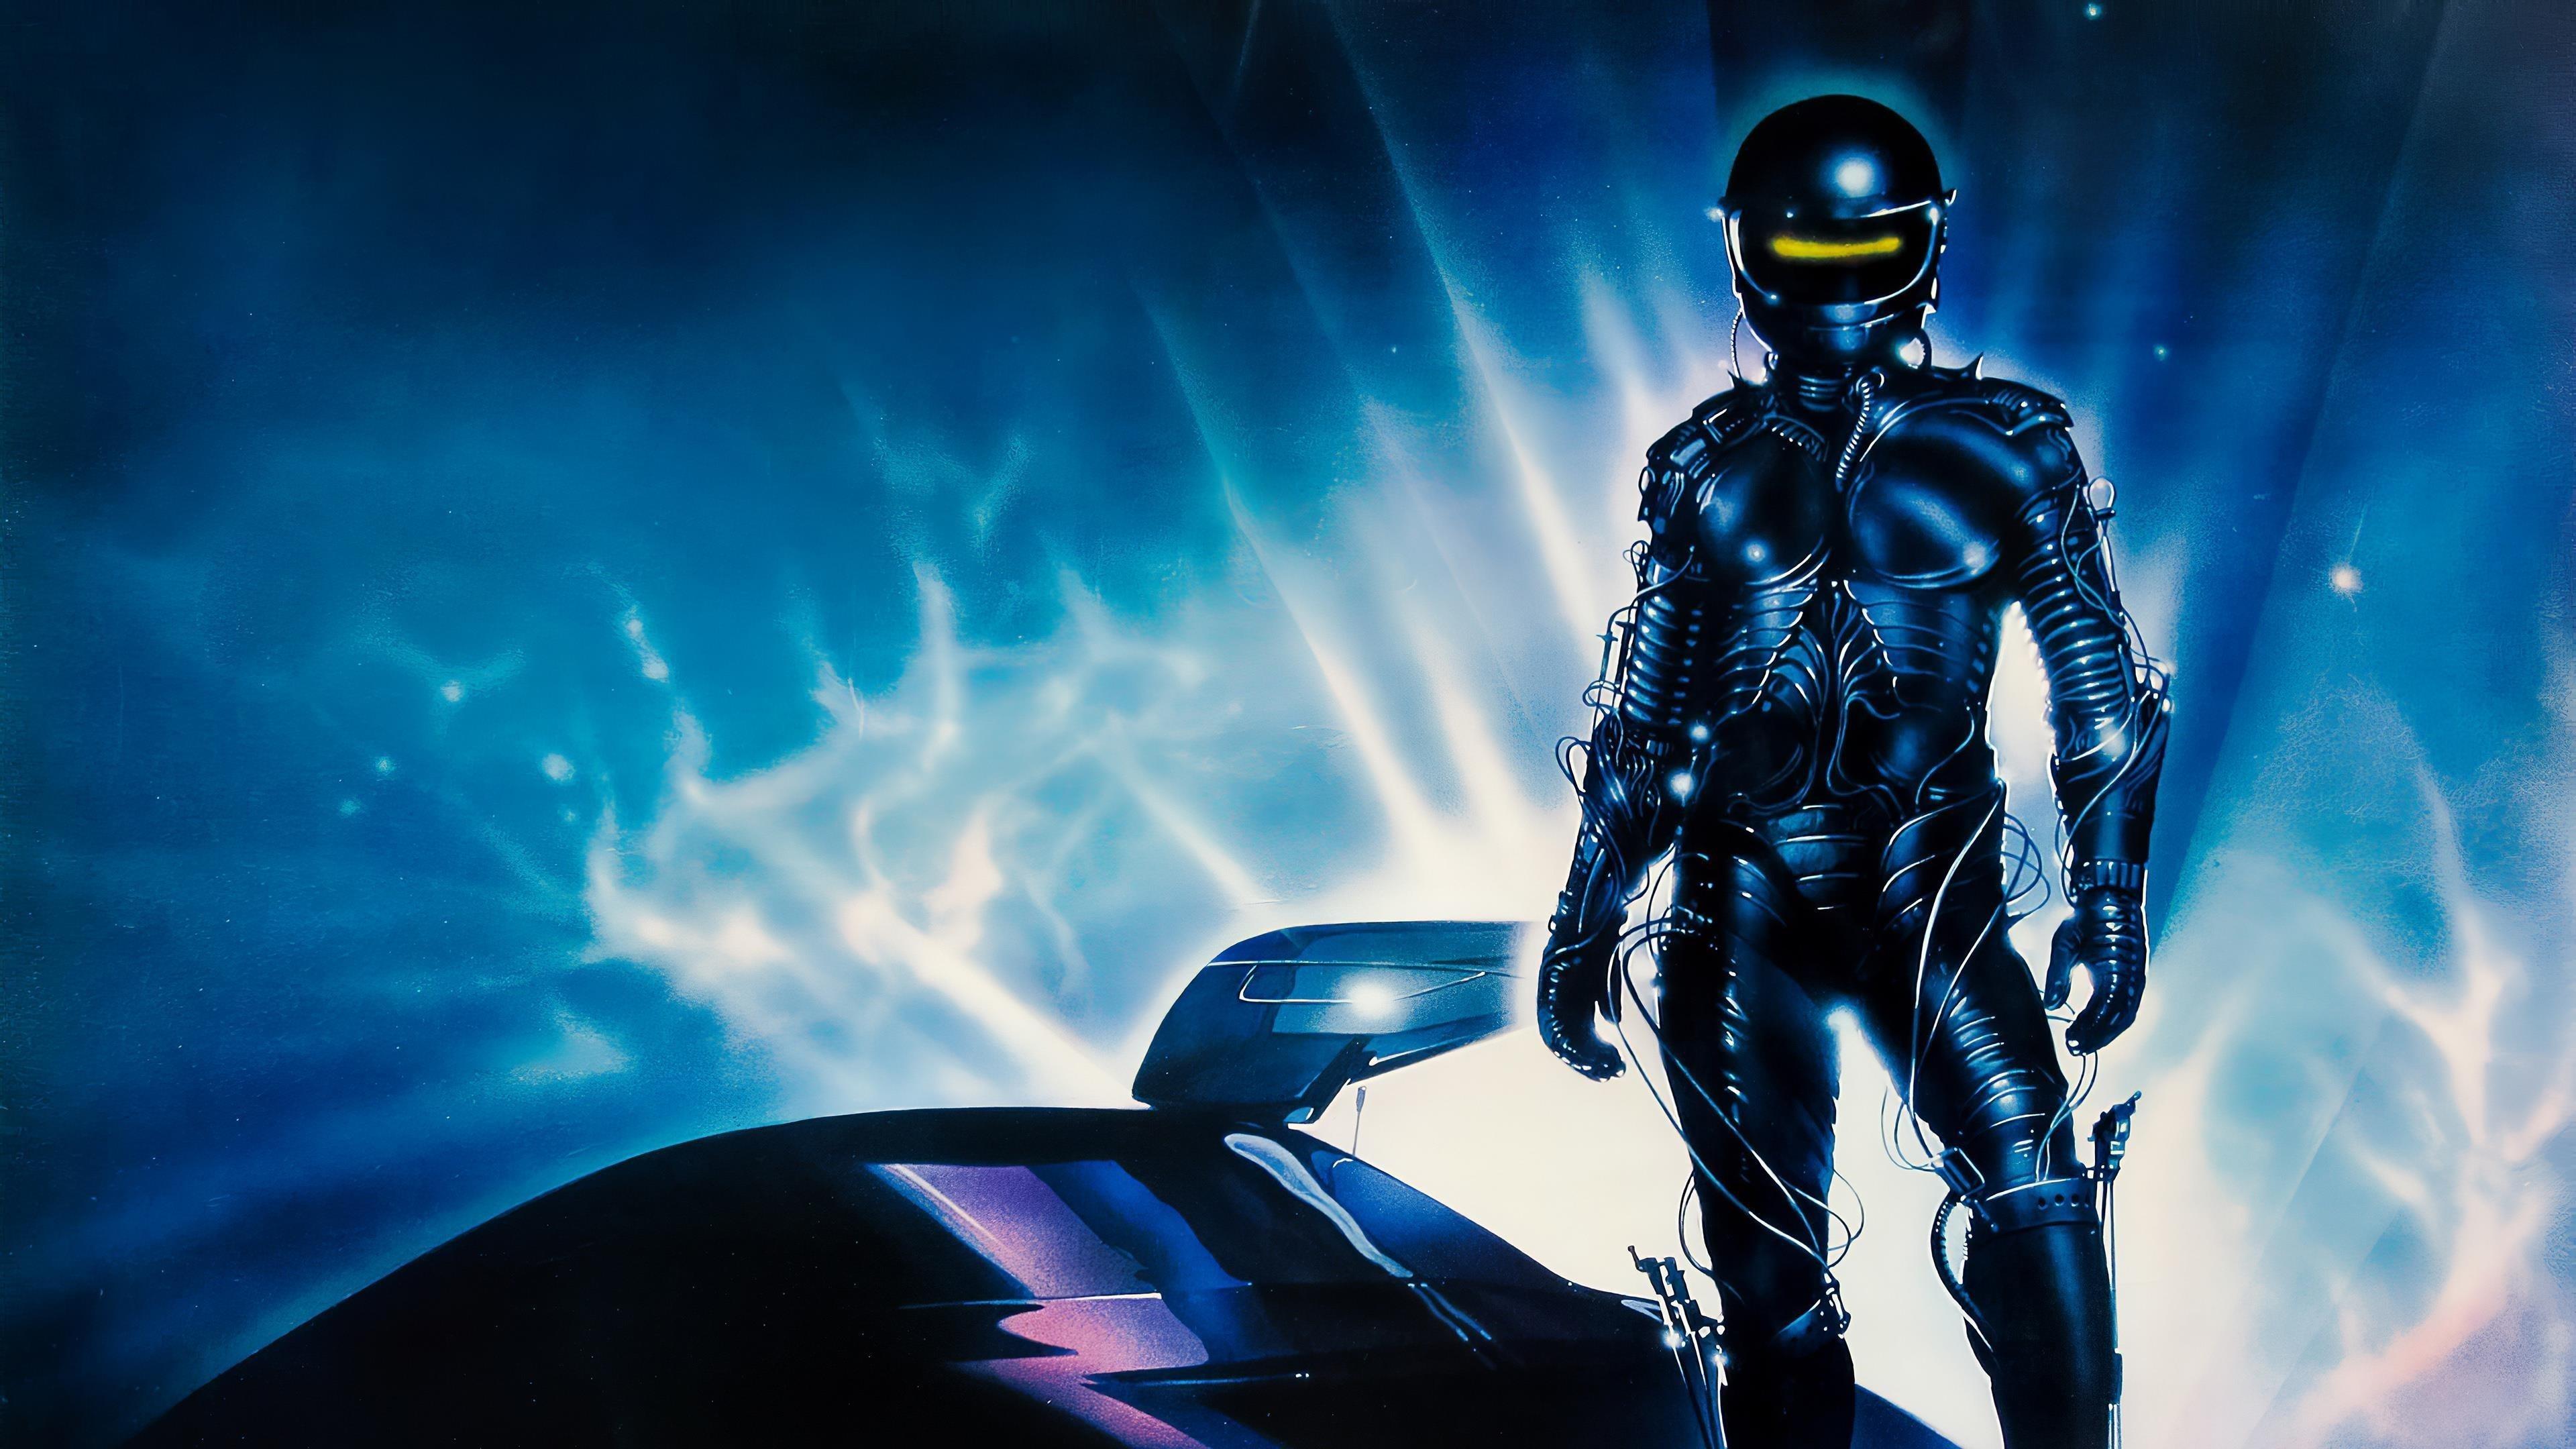 Плакат The wraith 1986 года обои скачать